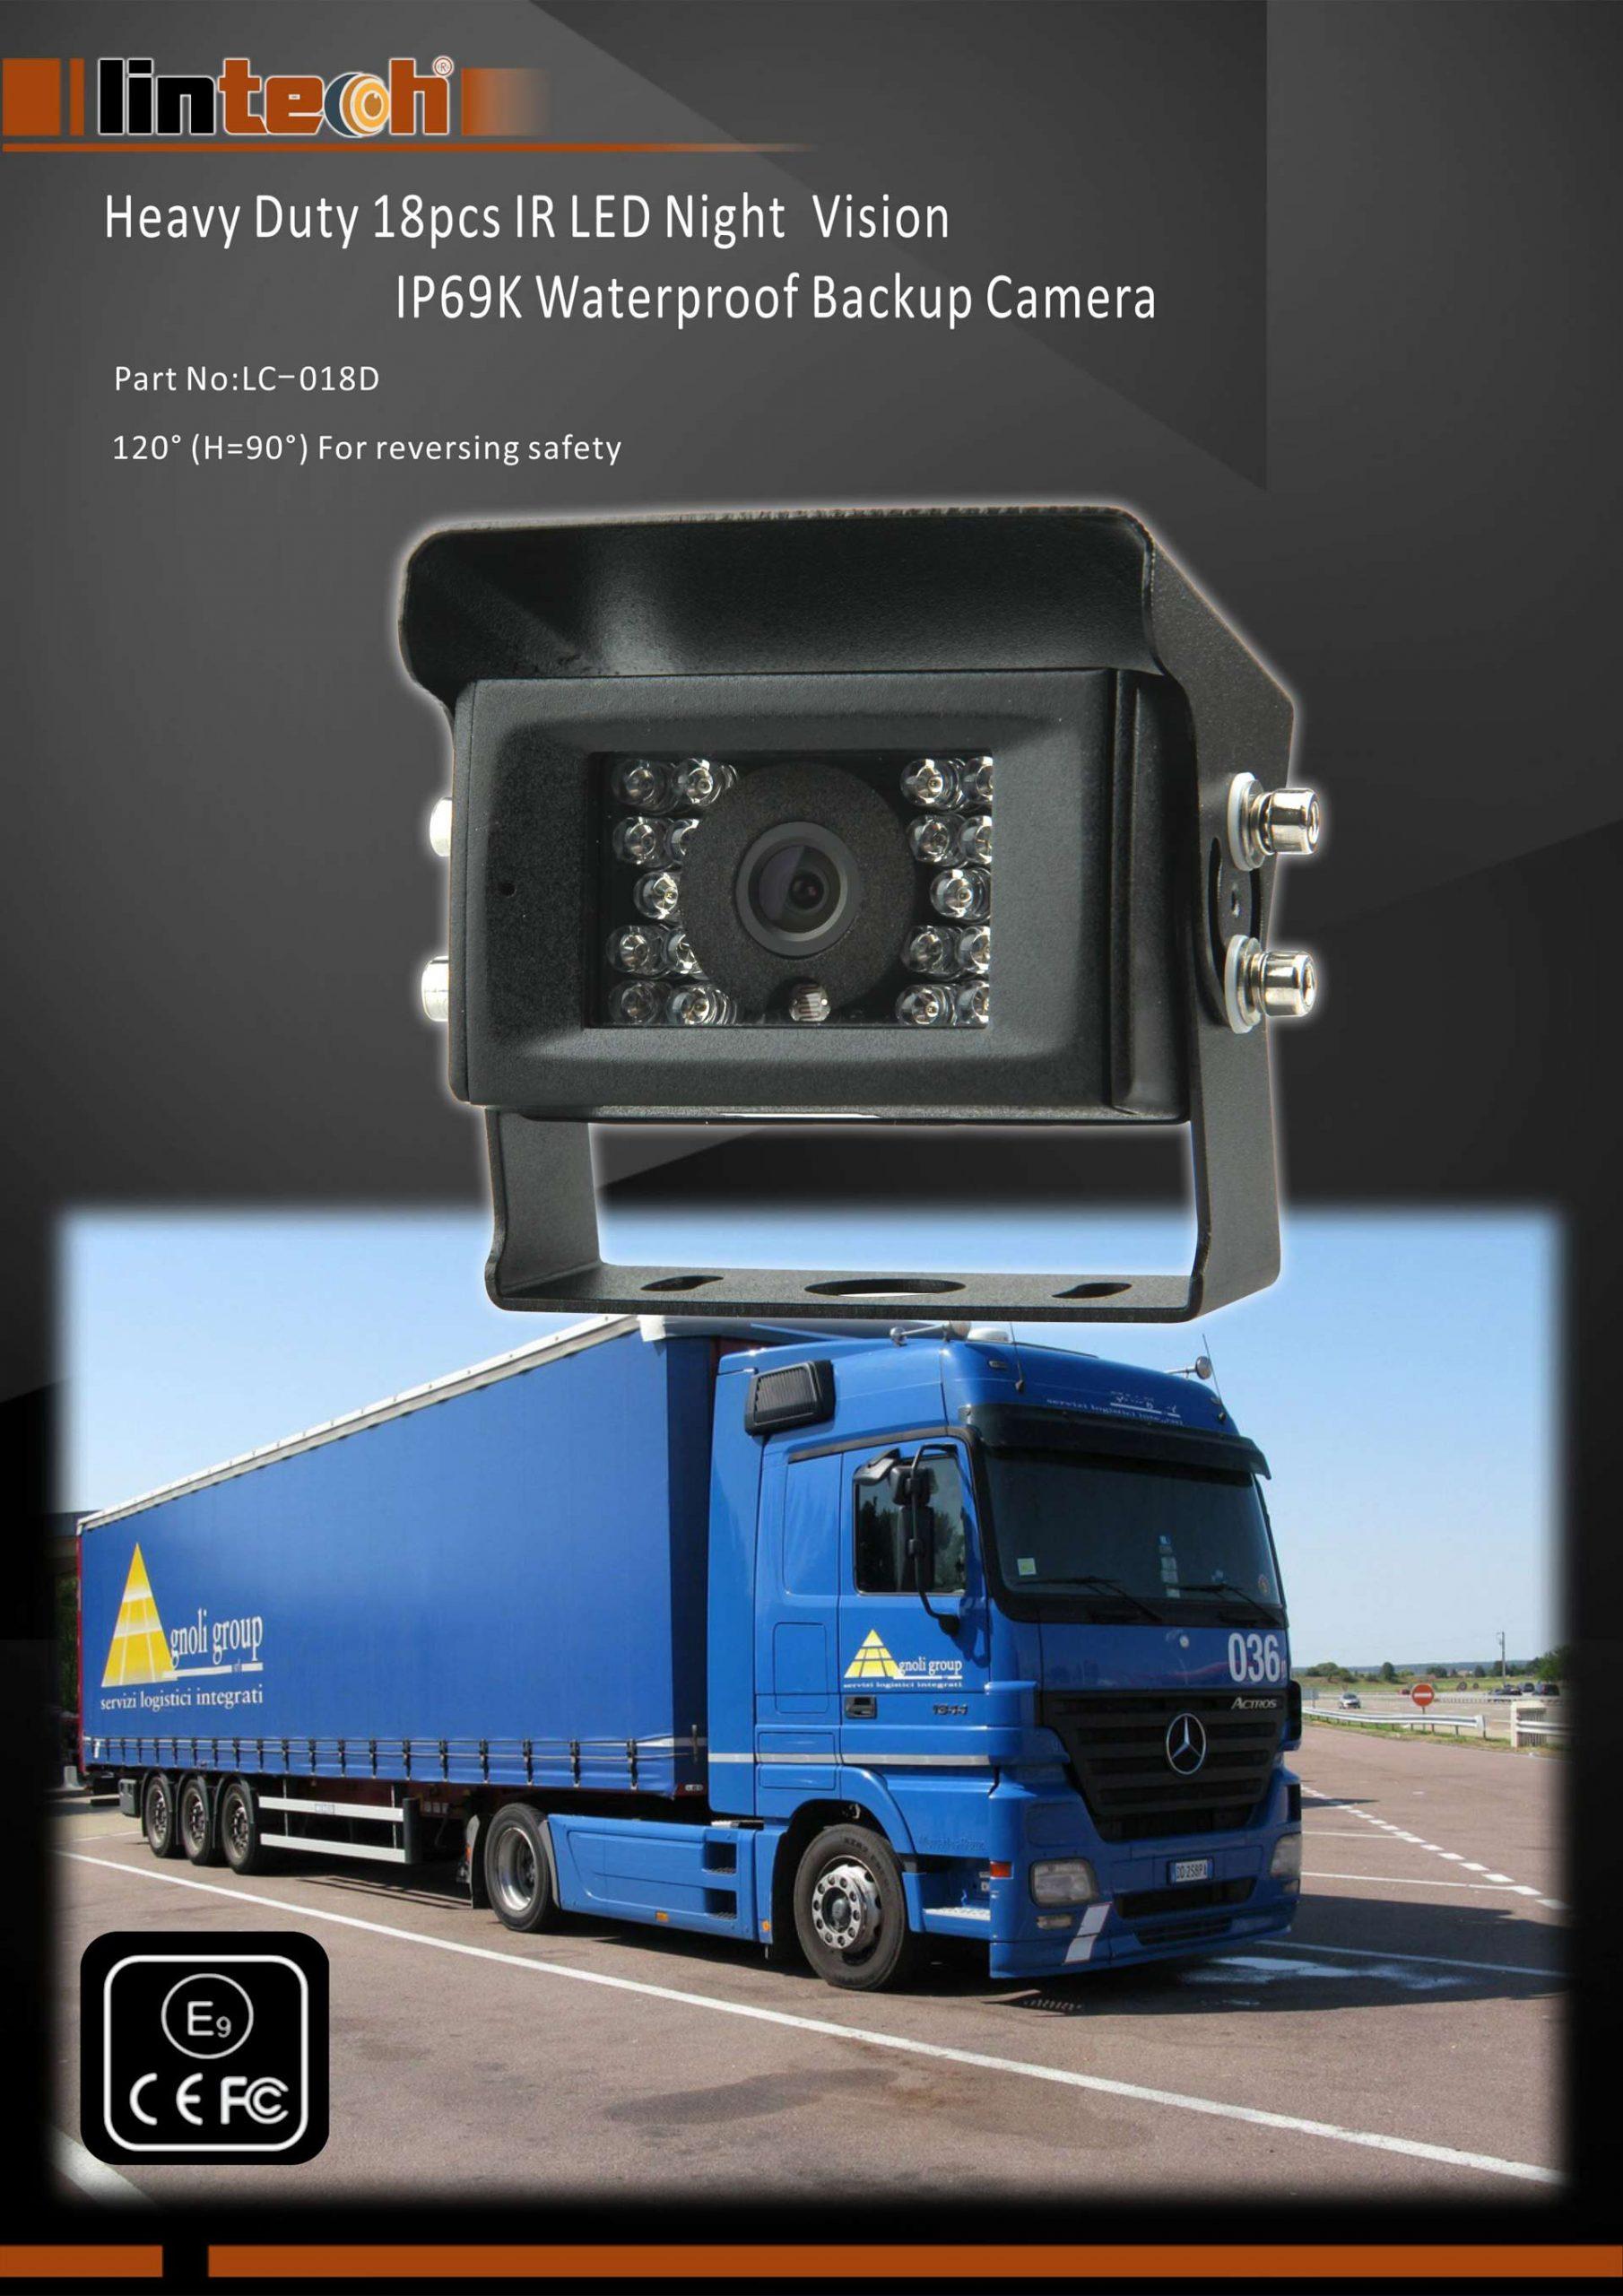 1.Heavy-Duty-18pcs-IR-LED-Night-Vision-IP69K-Waterproof-Backup-Camera